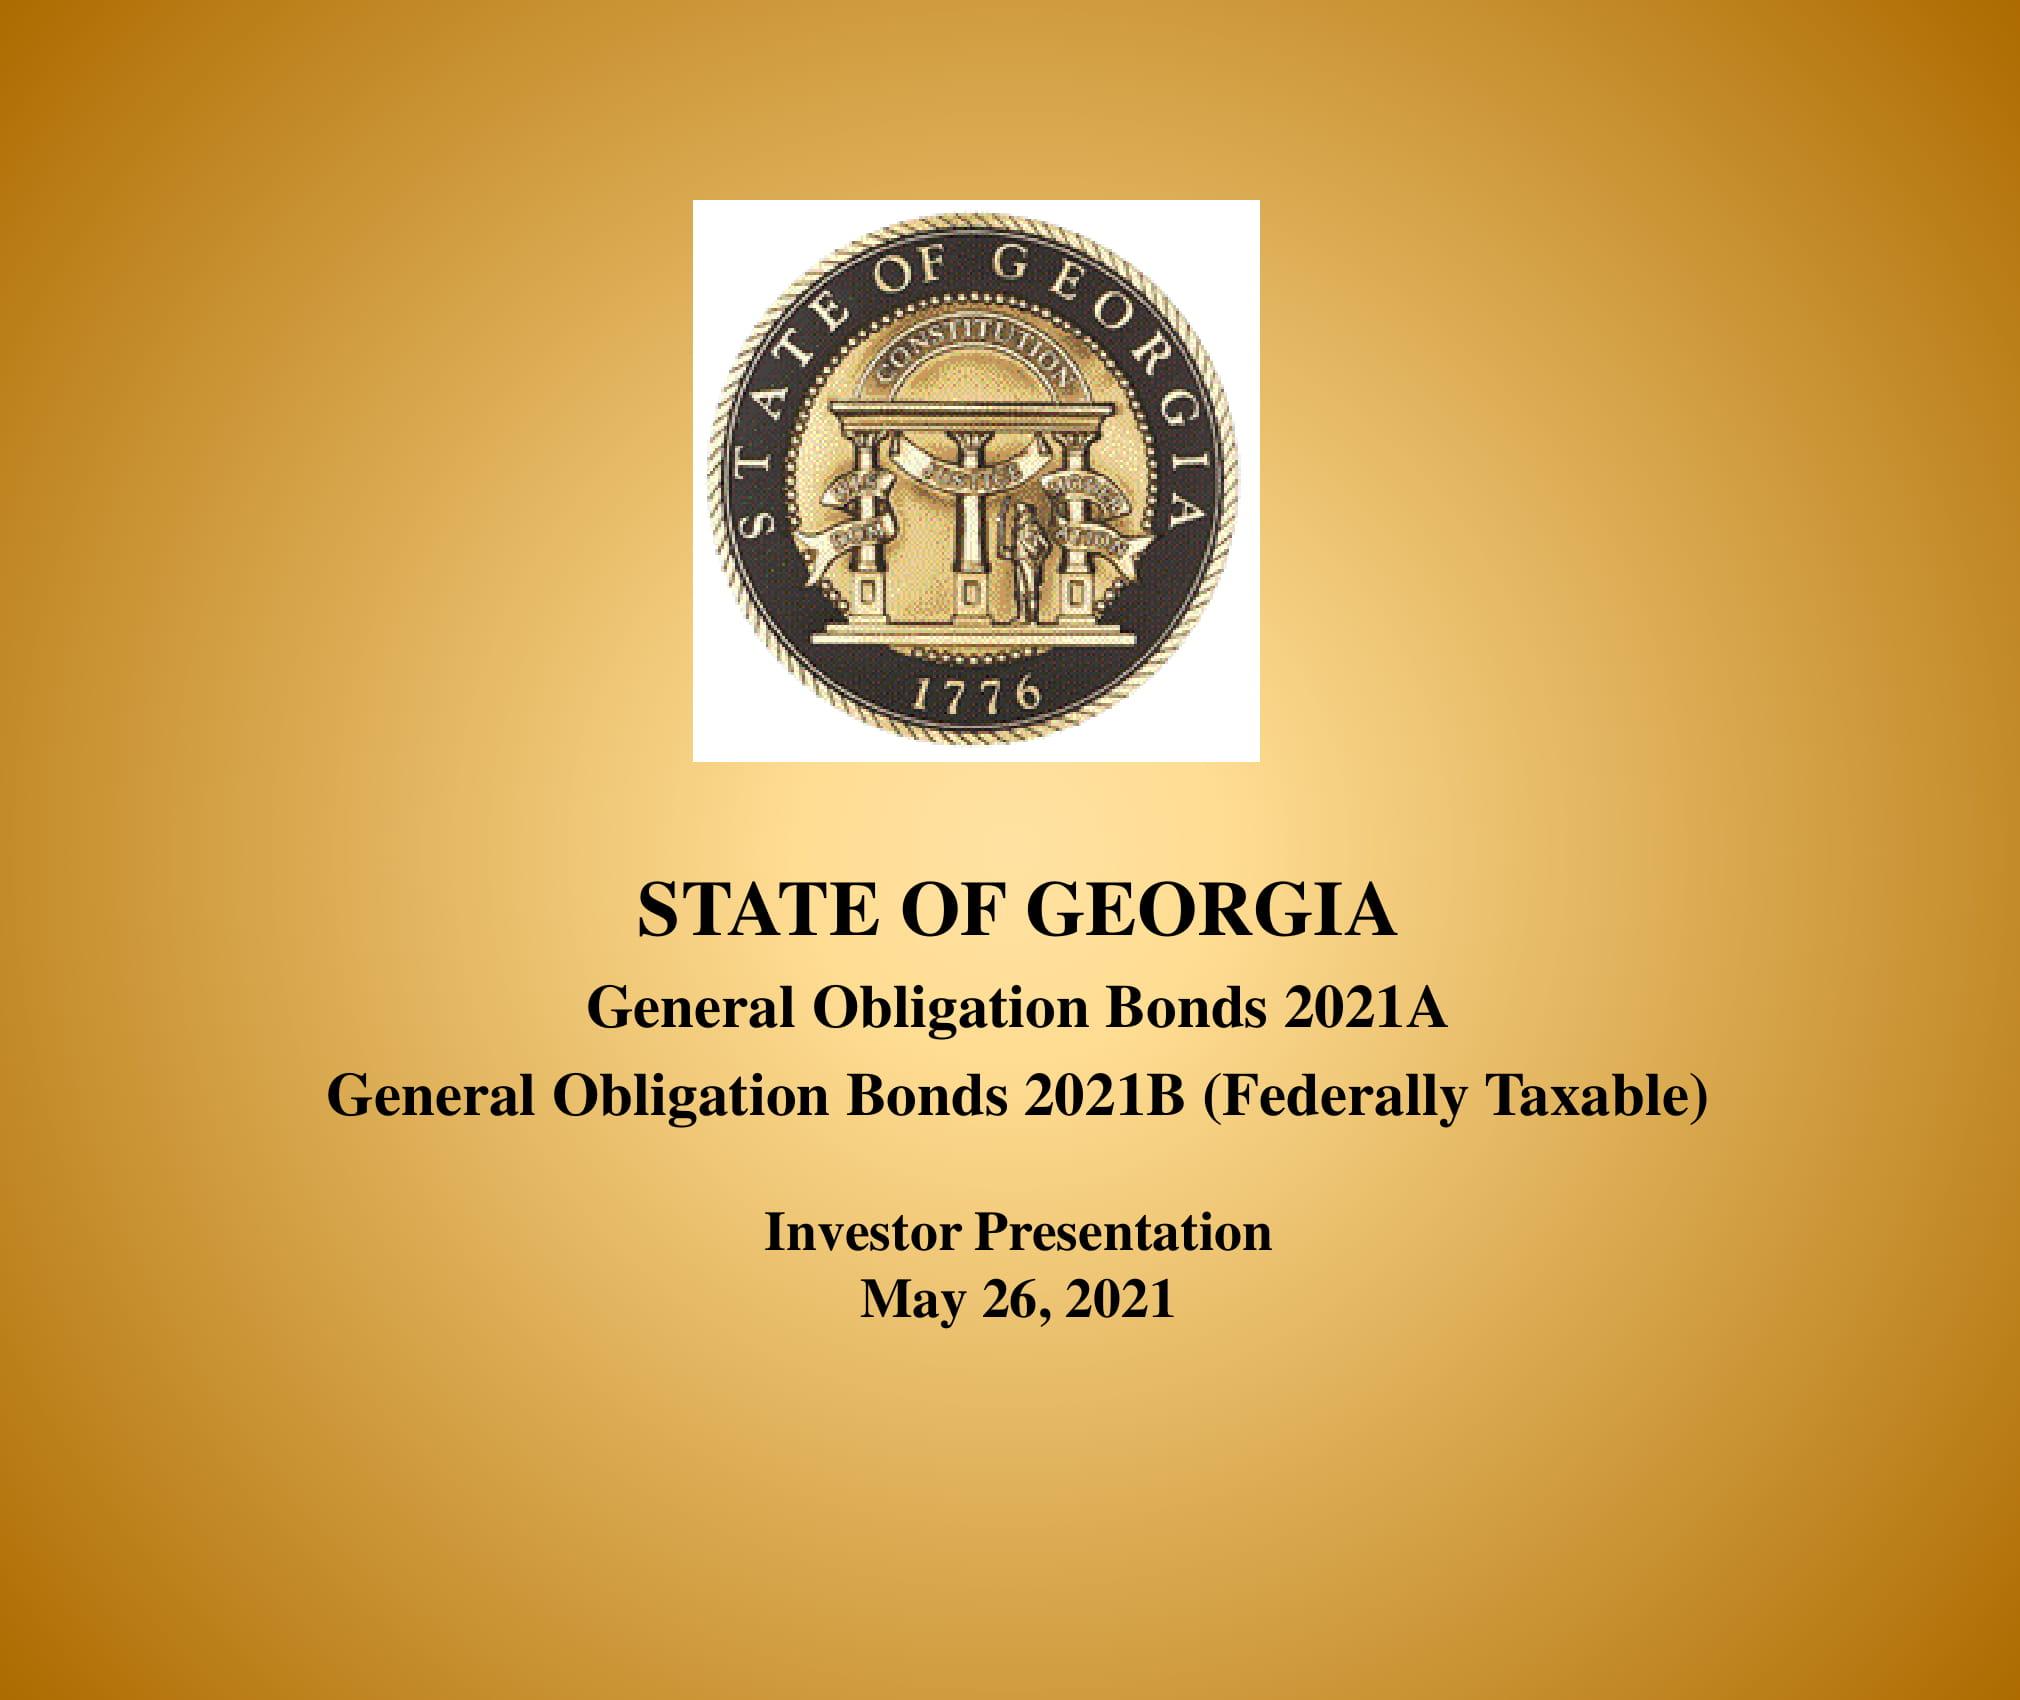 General Obligation Bonds 2021A&B